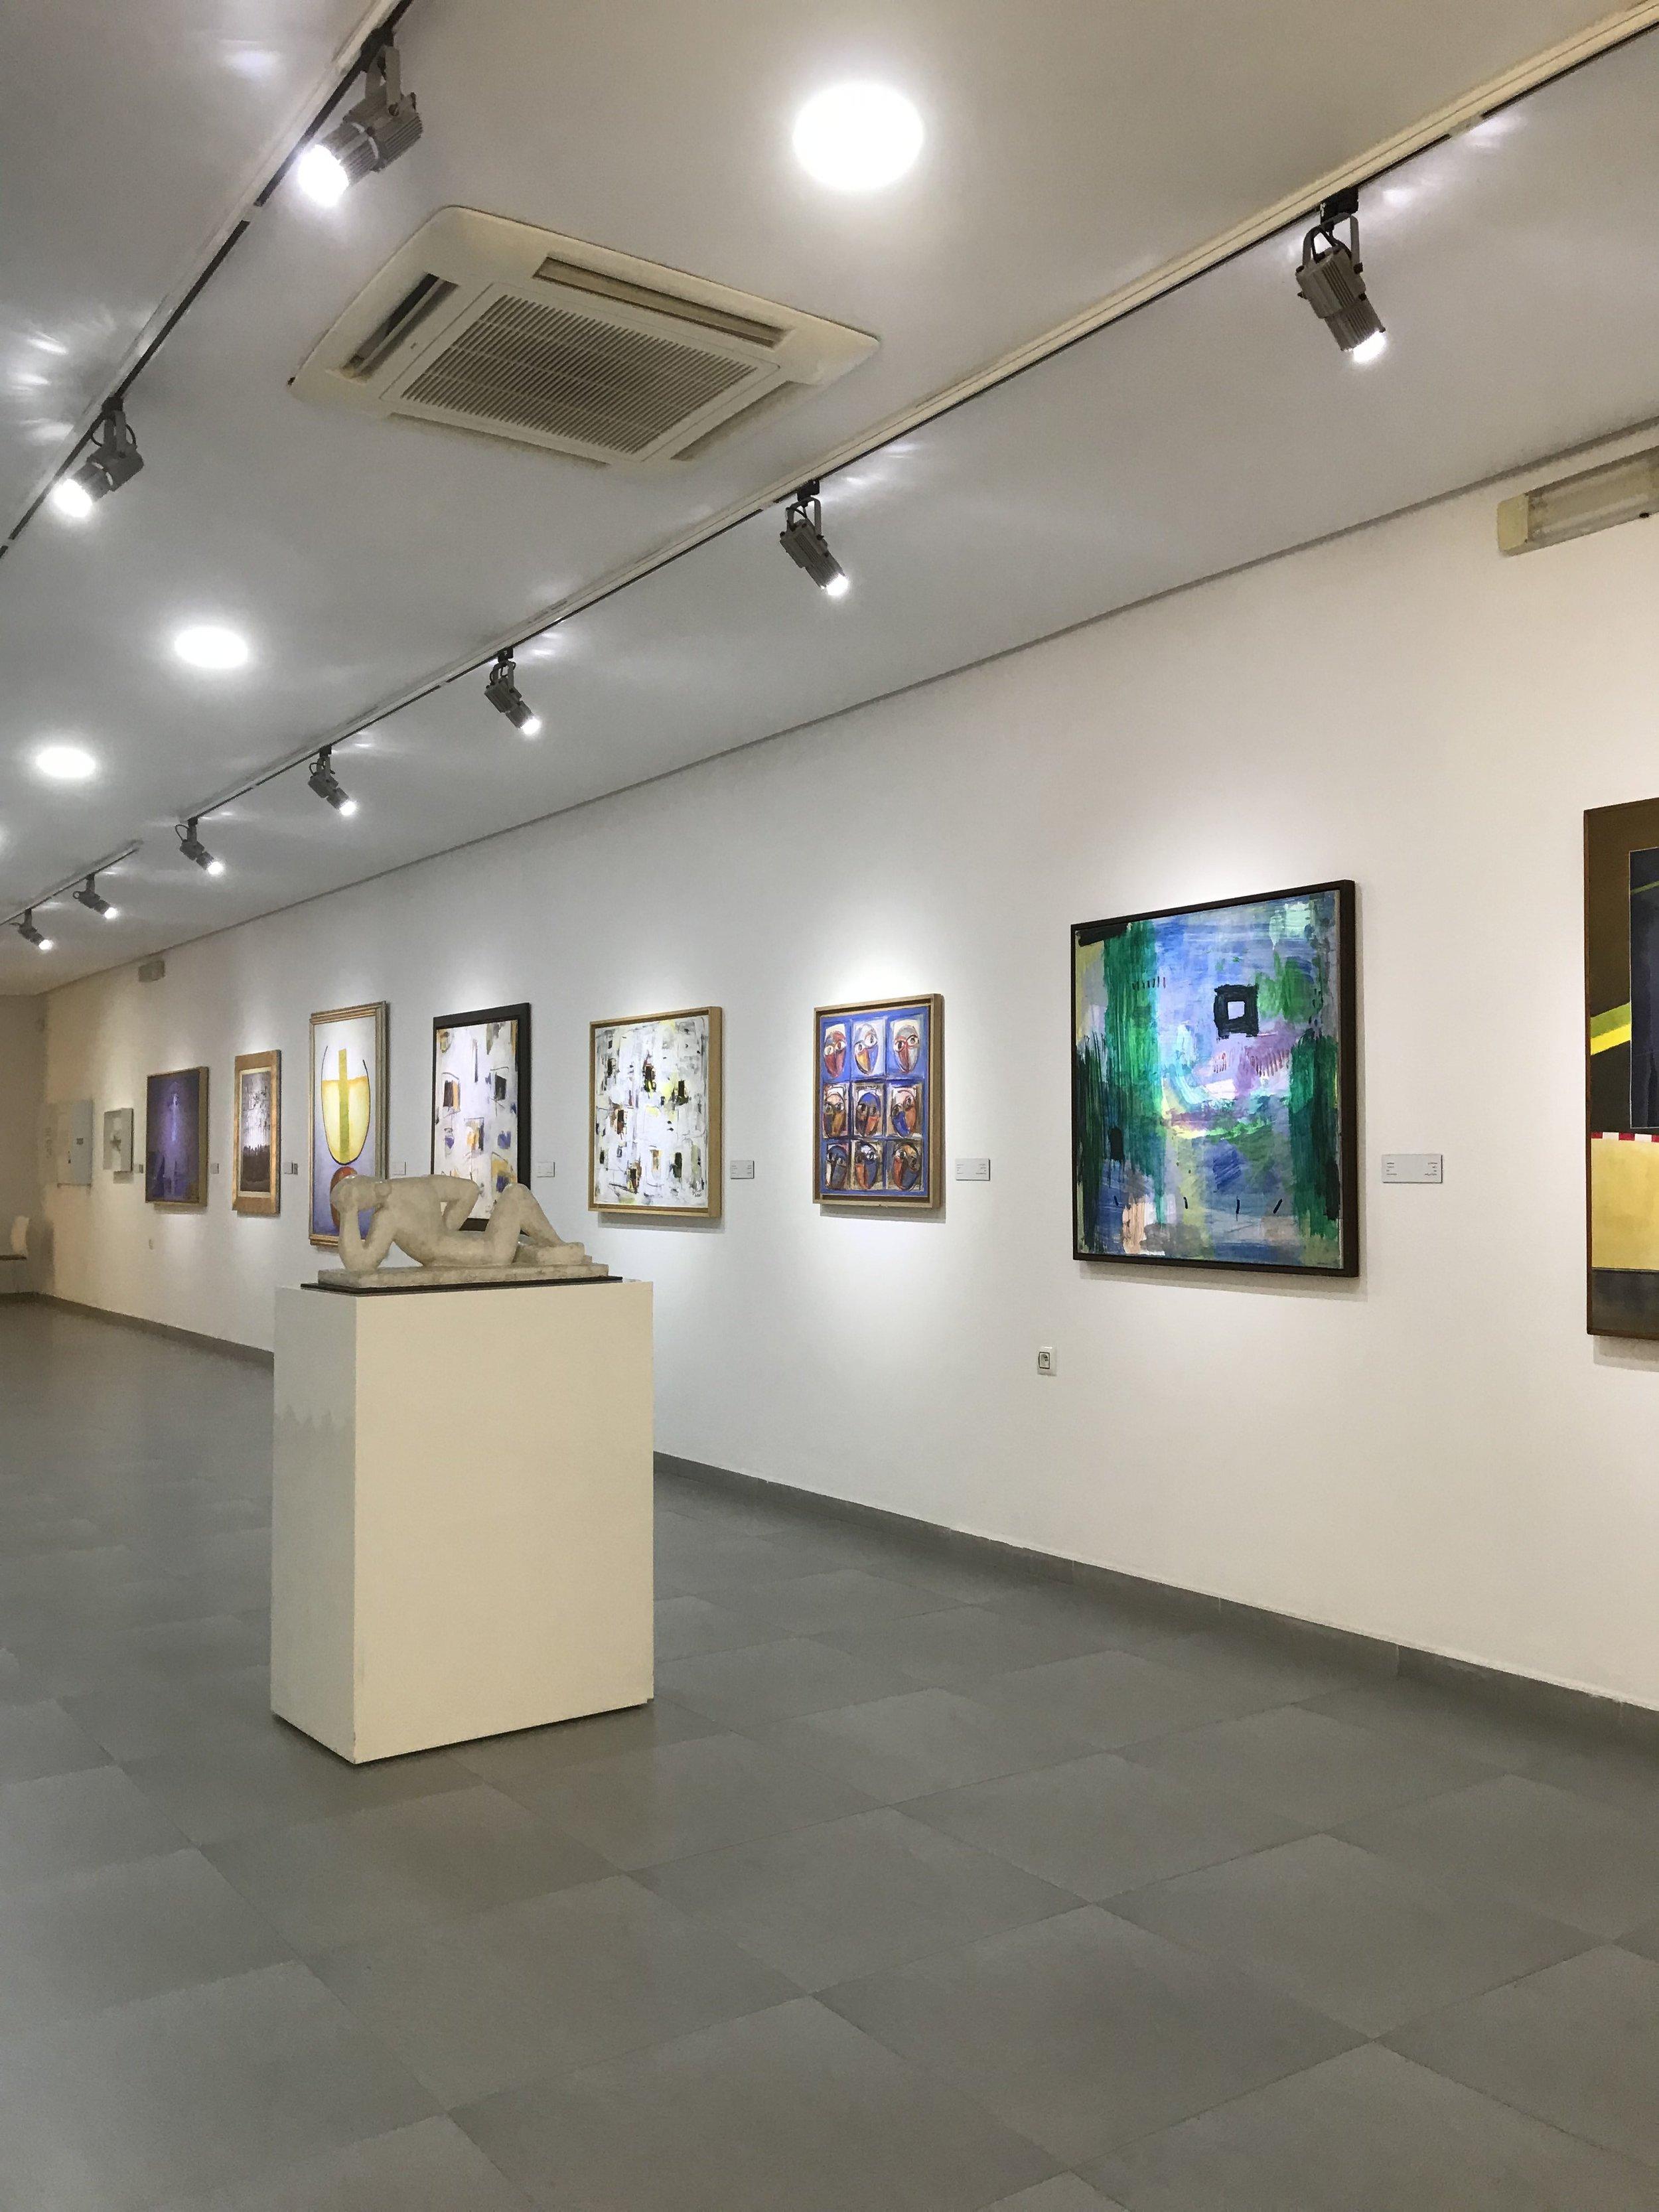 Third Room of the Center of Modern Art